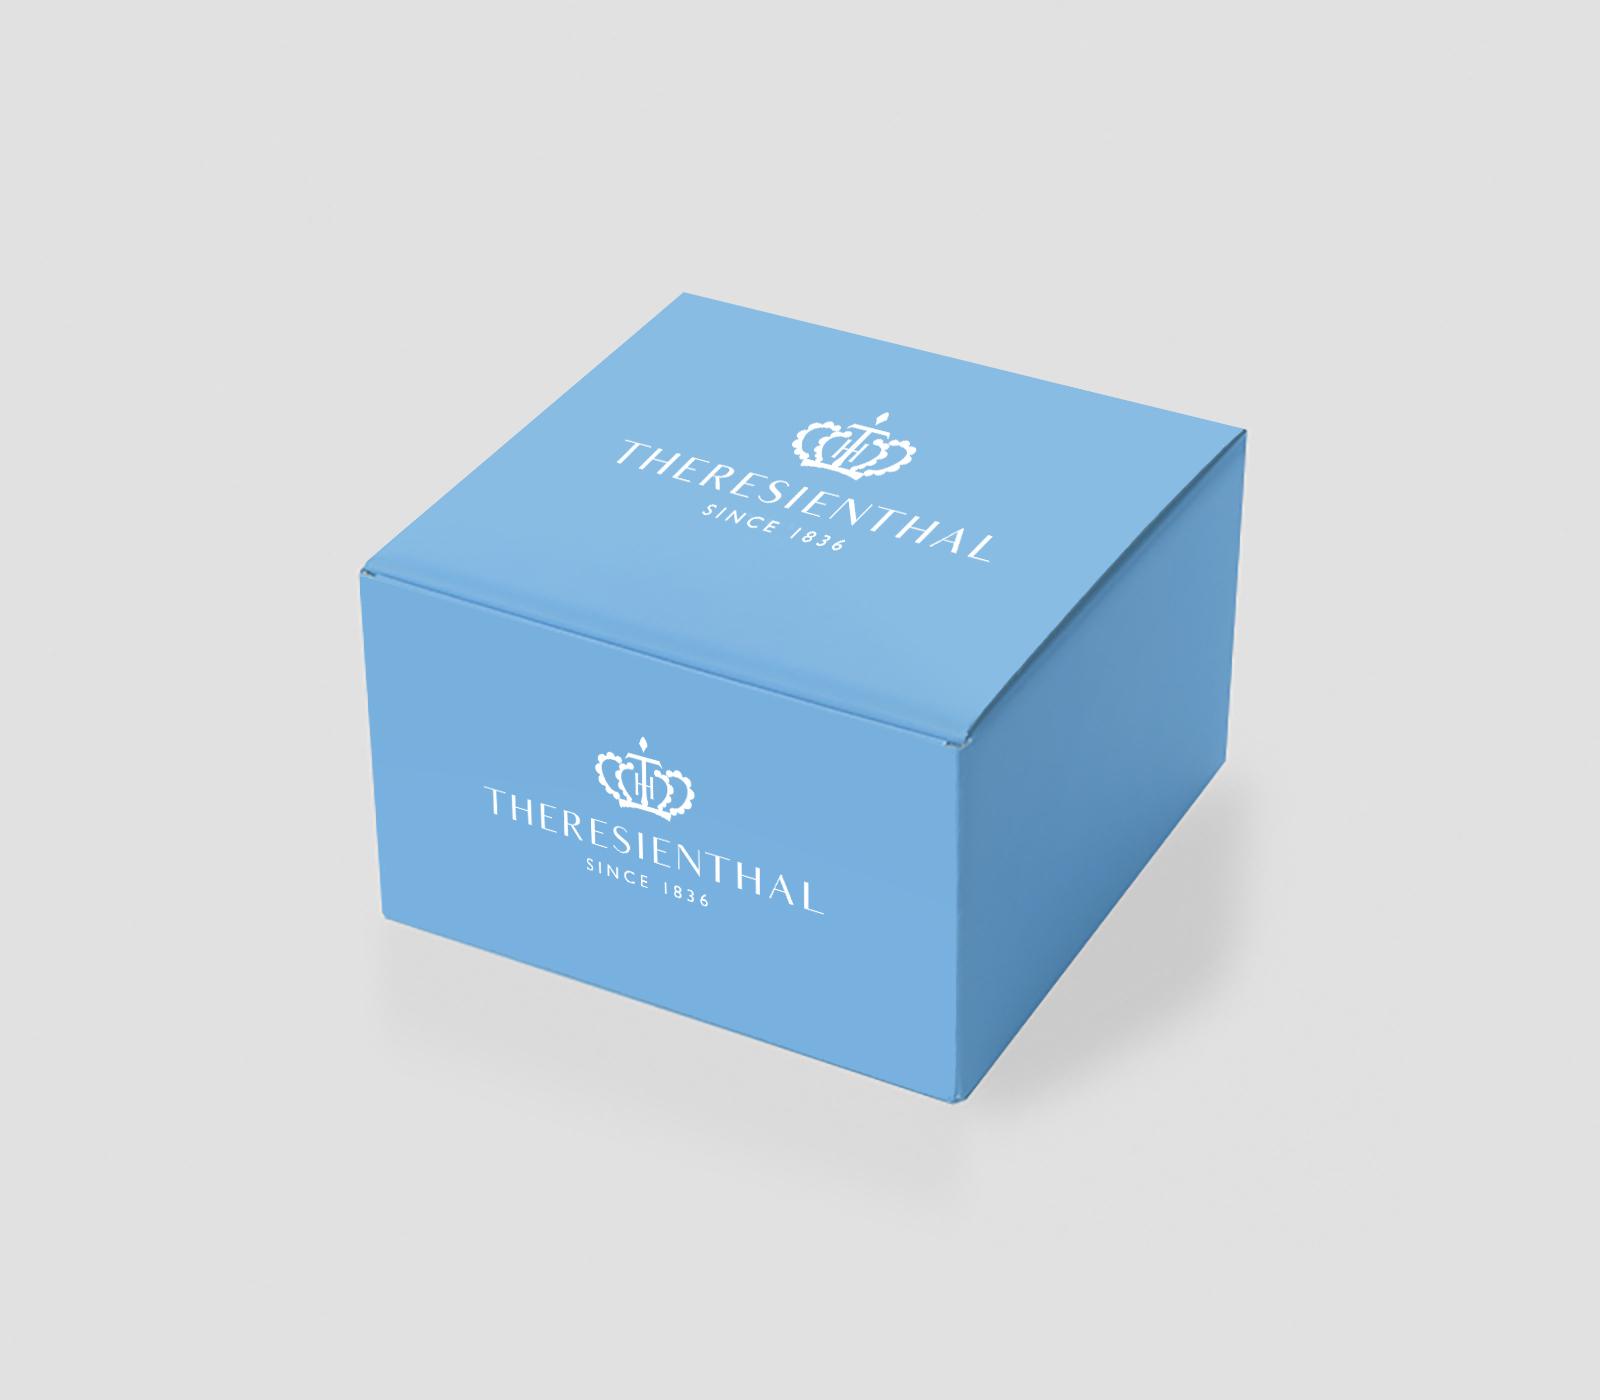 Theresienthal_Box